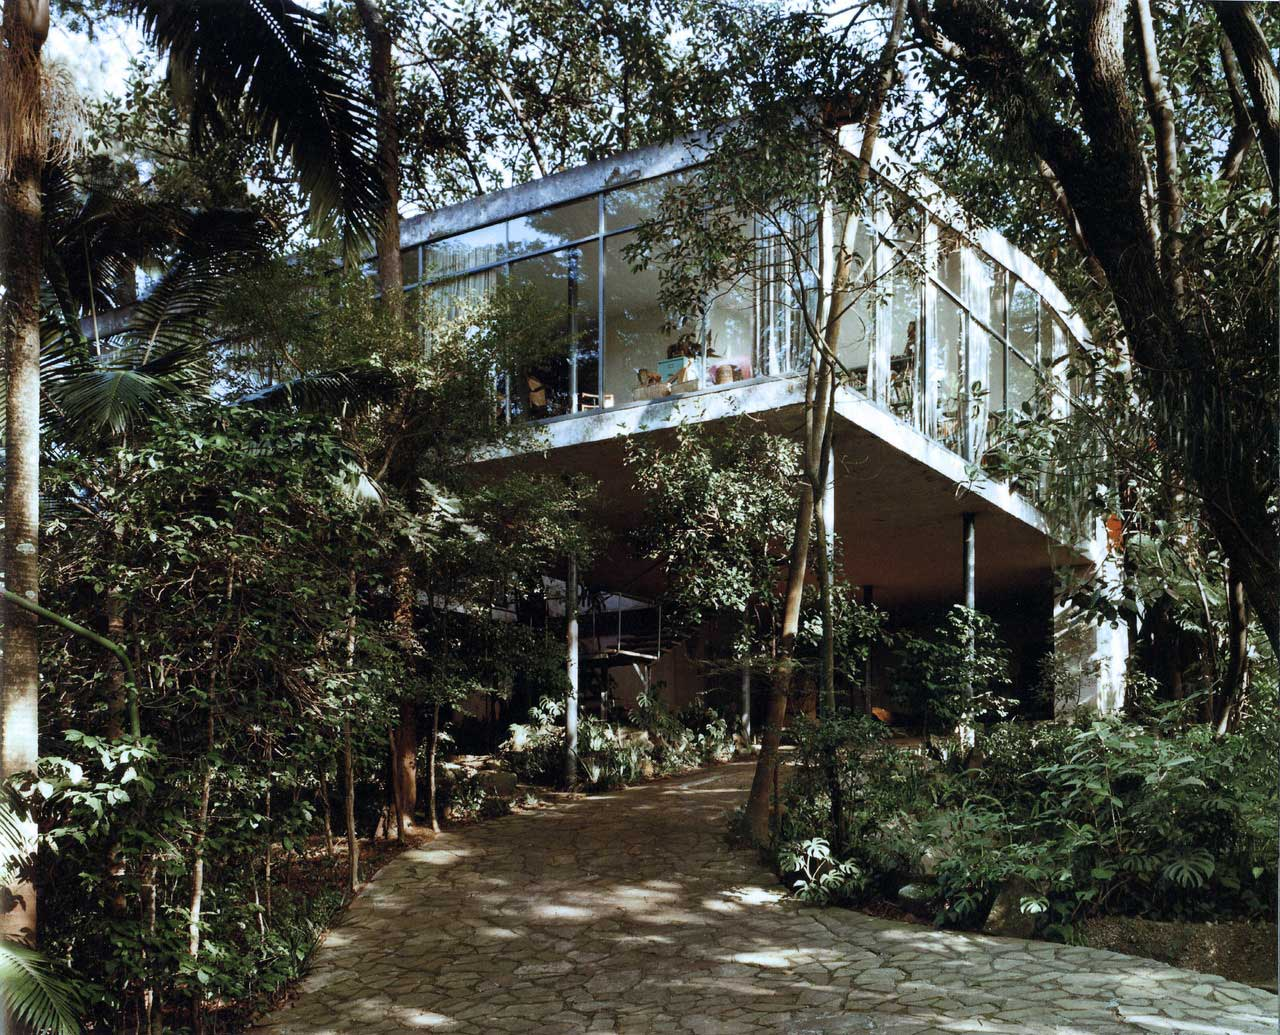 Casa de Vidro (Glass House) by Lina Bo Bardi | Yellowtrace